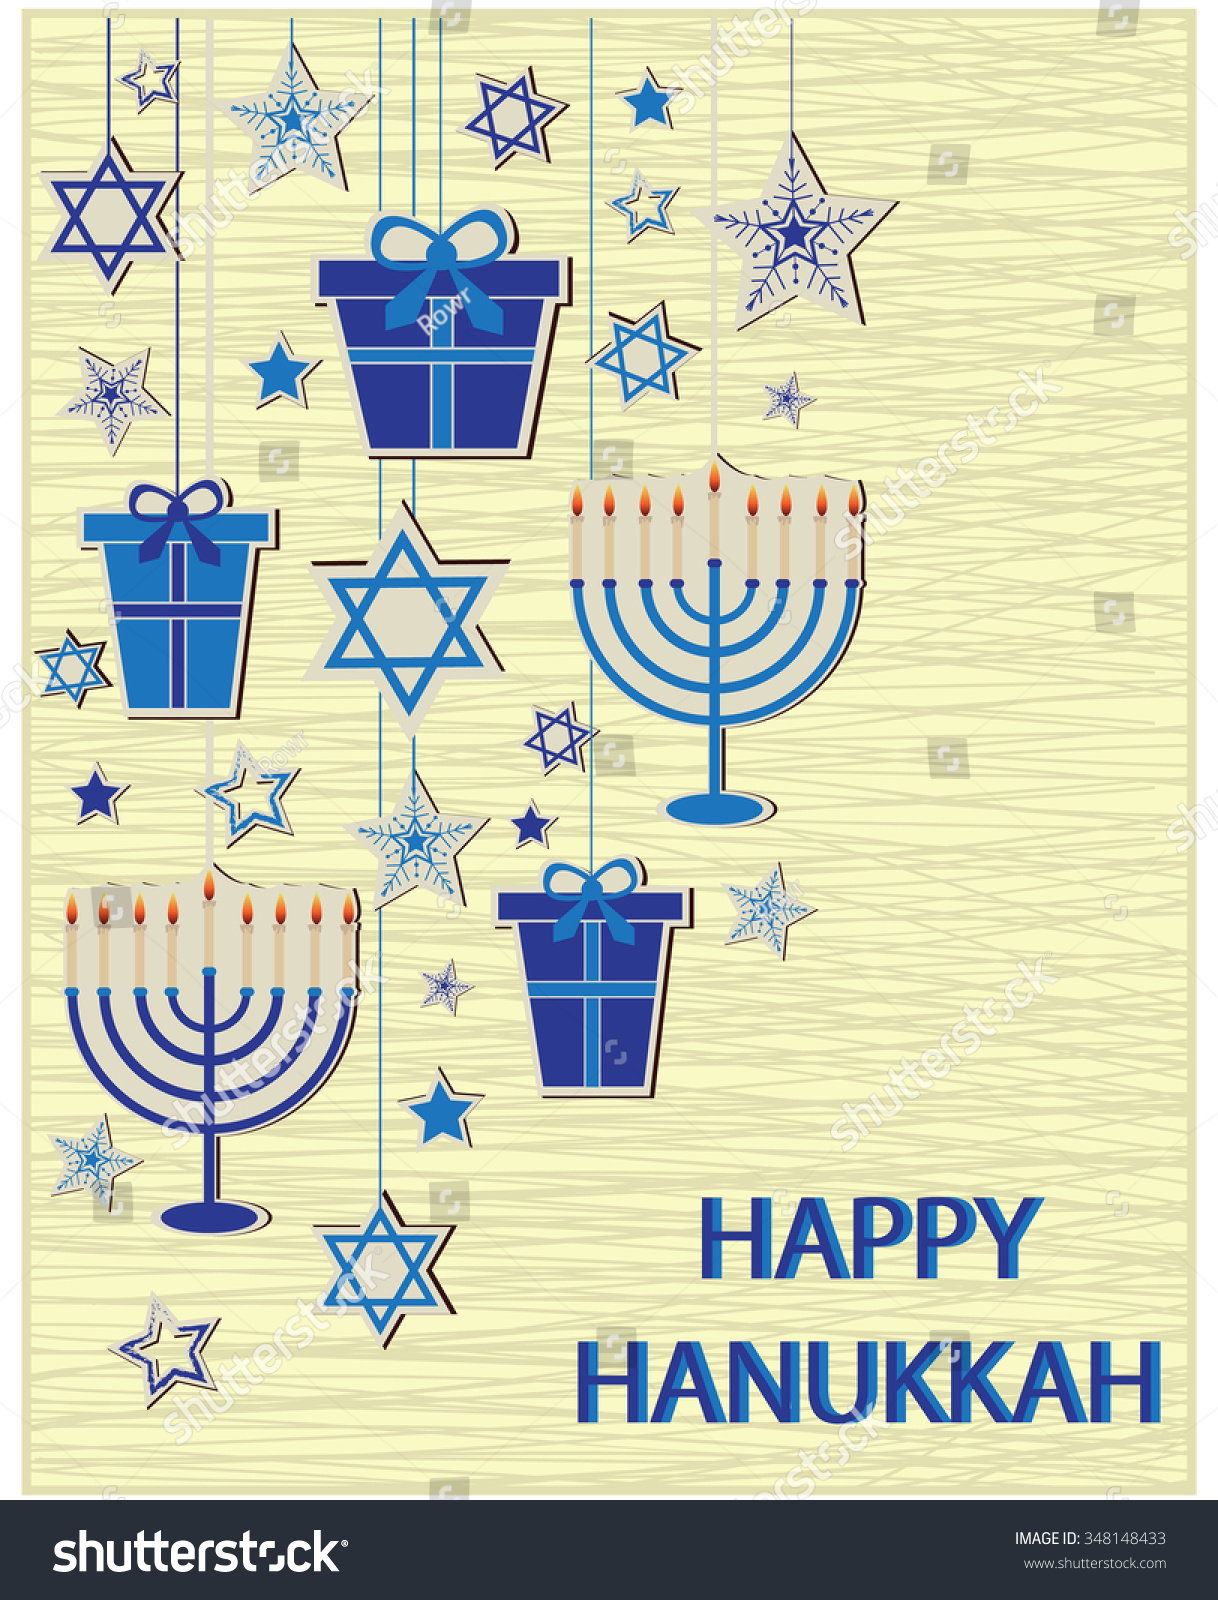 Happy Hanukkah Greeting Card Vector Illustration Stock Vector